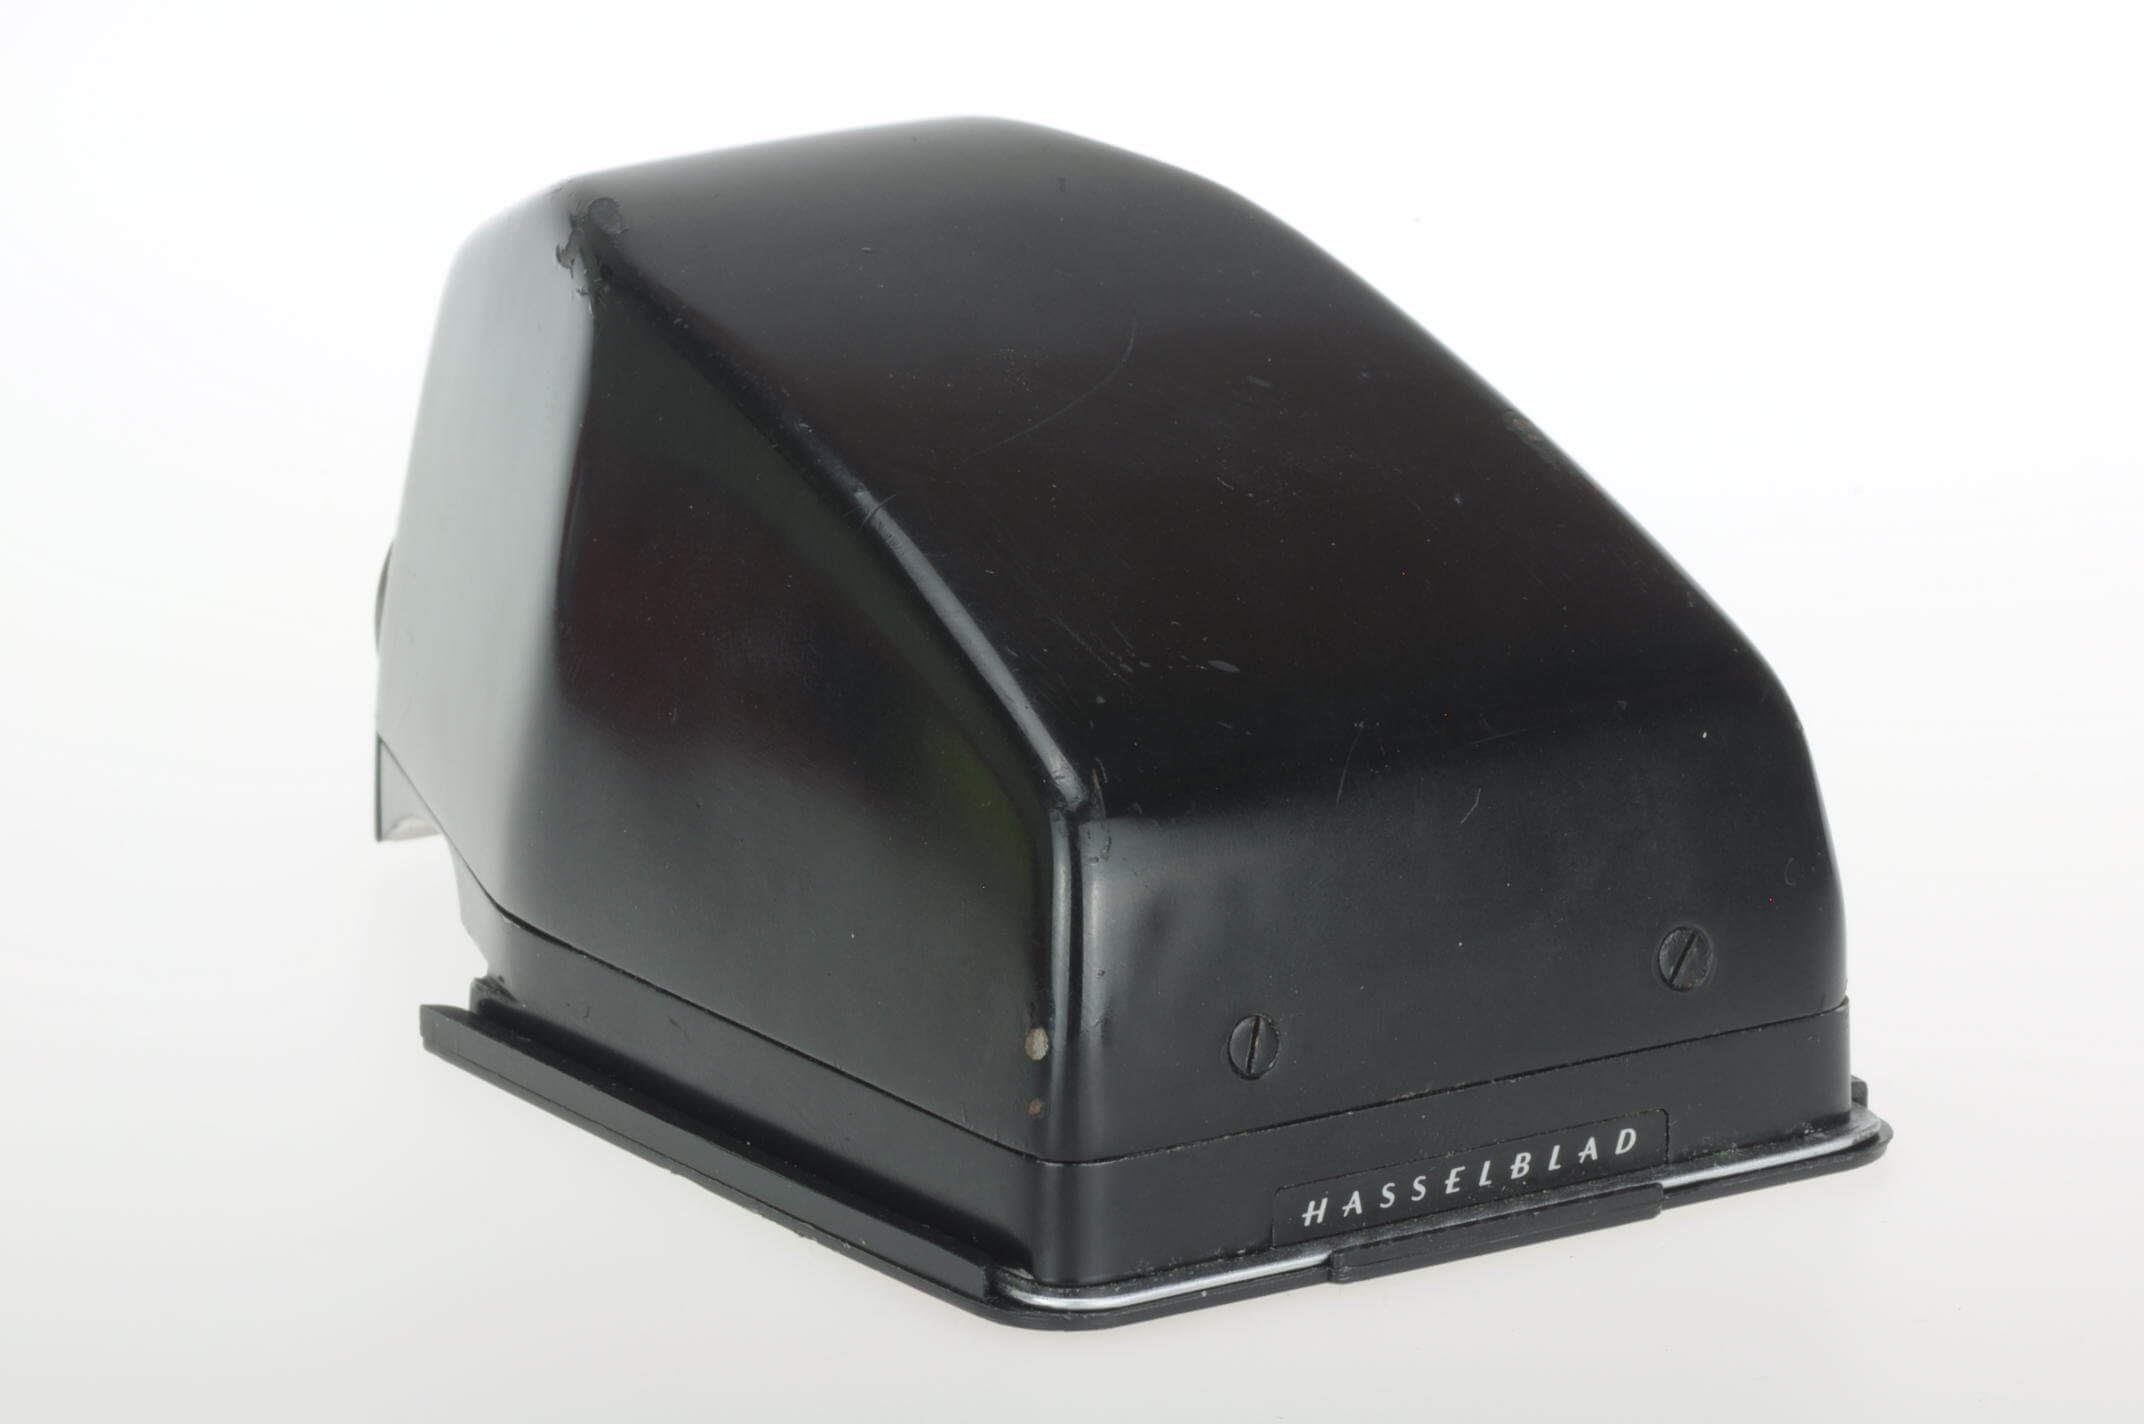 Hasselblad 90 degree prism